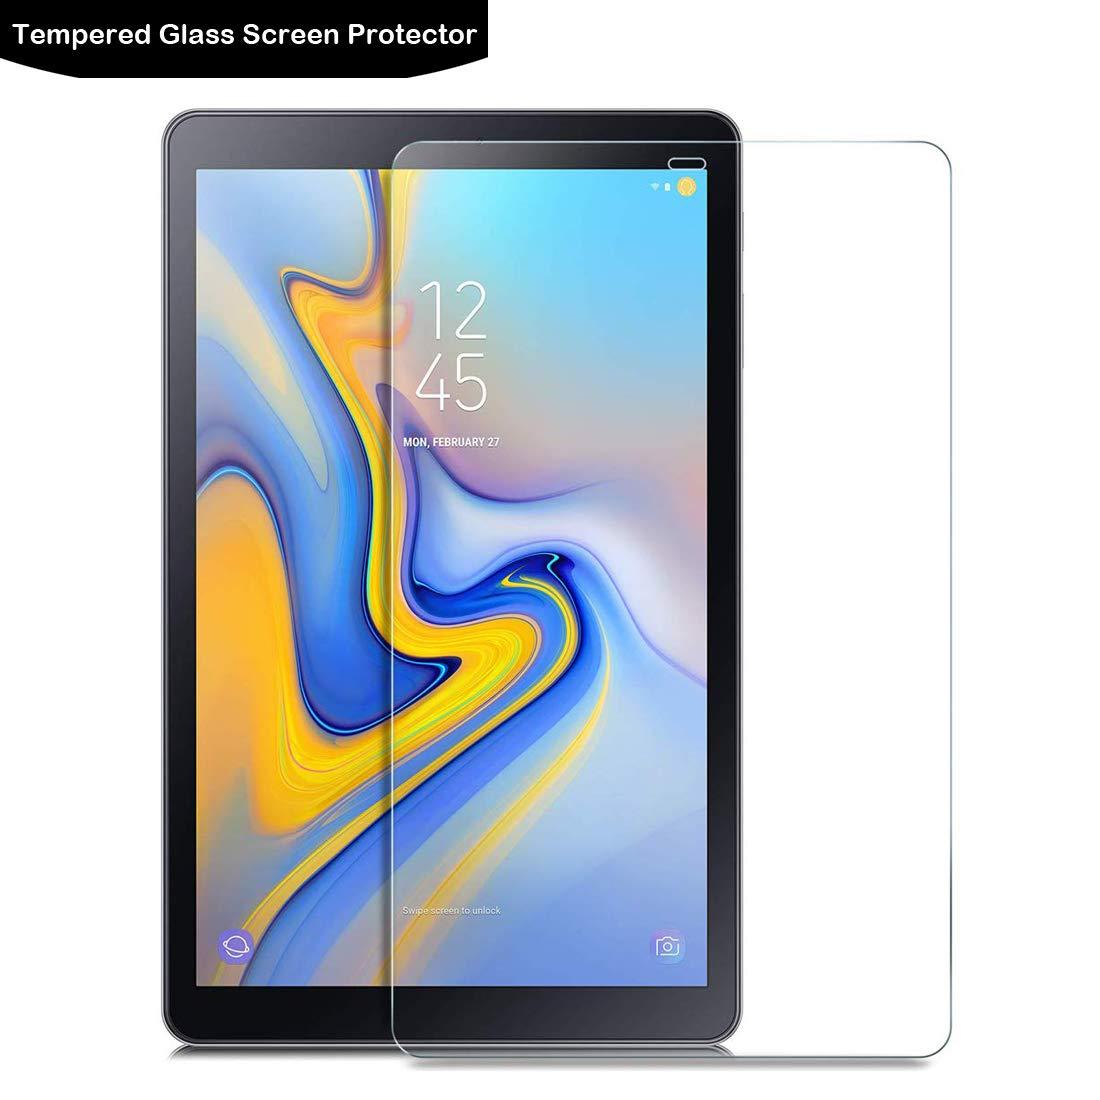 LOKEKE 2.5D ラウンドエッジ 強化ガラス スクリーンプロテクター サムスン Galaxy Tab A 10.1 (2019) SM-T510/ T-515用 本物のガラス製   B07QS2MTS9